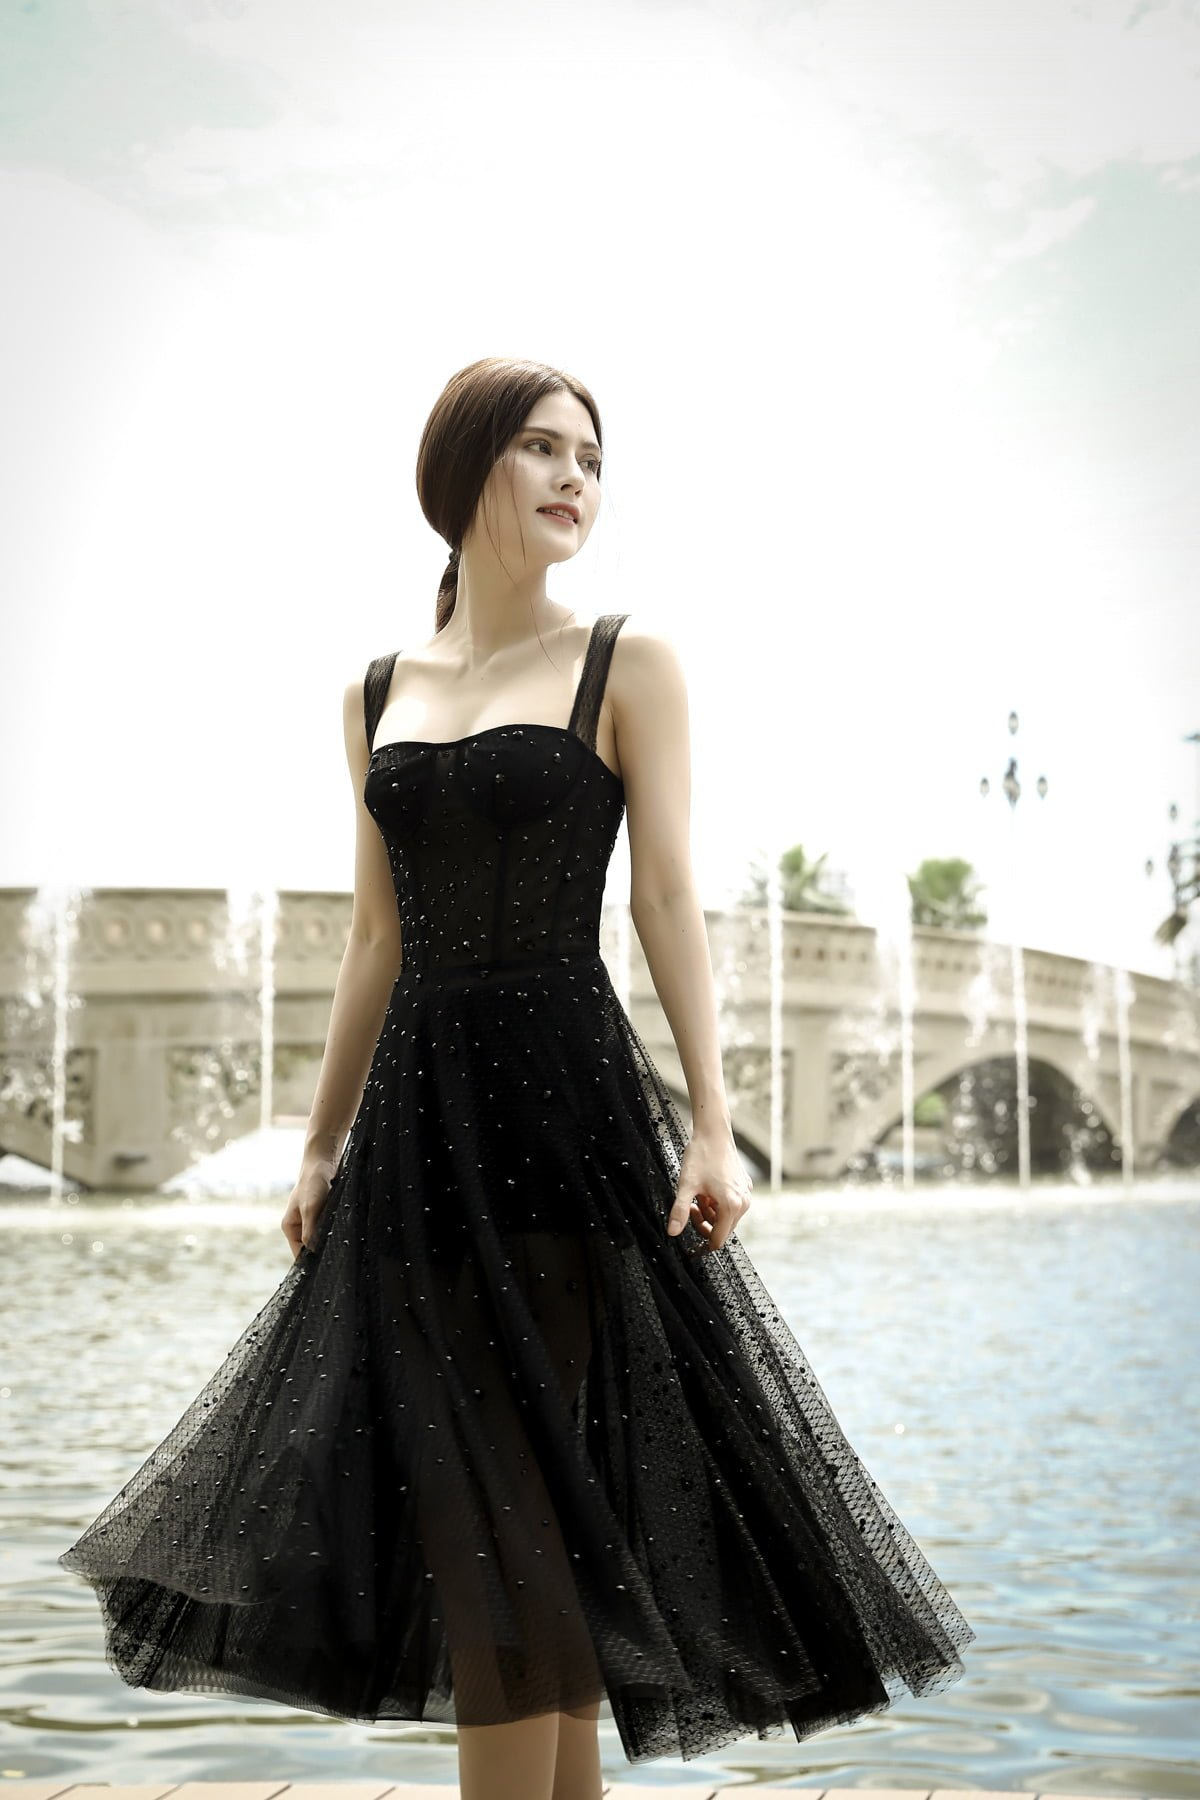 Tere-Anna Corset Tulle Dress 1